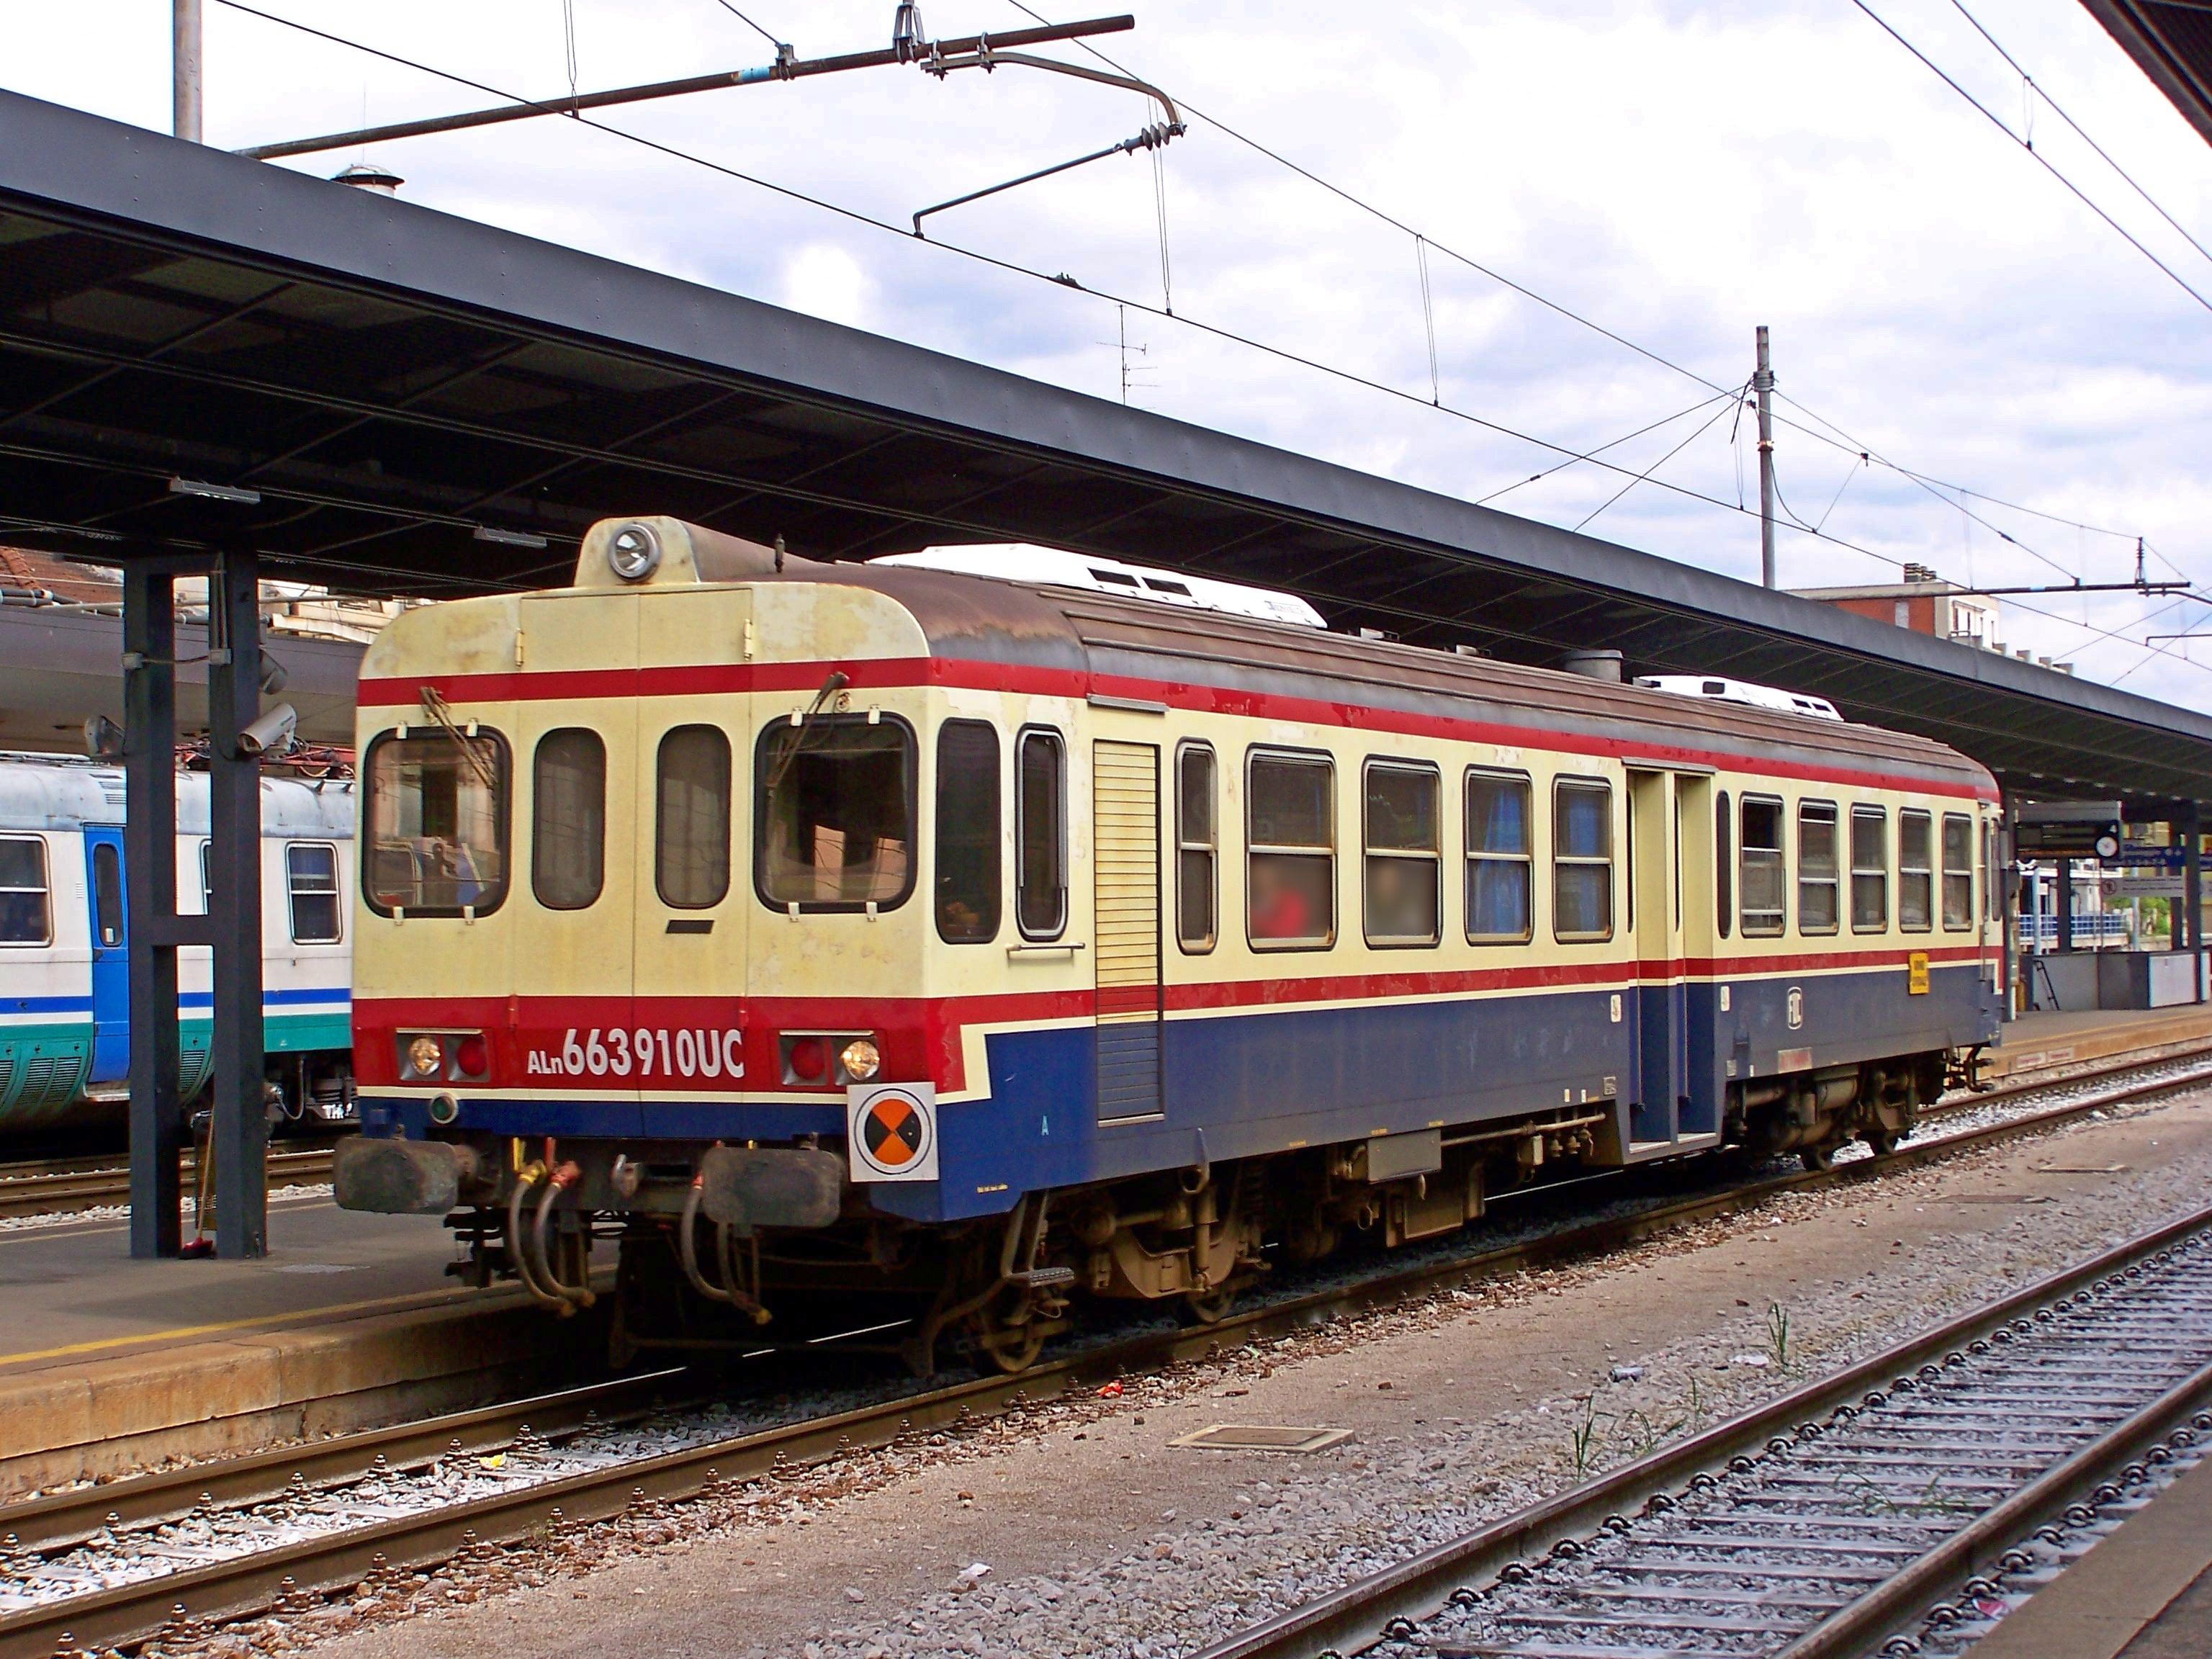 File:FUC ALn 663 910 Udine stazione 20120514b.JPG ...